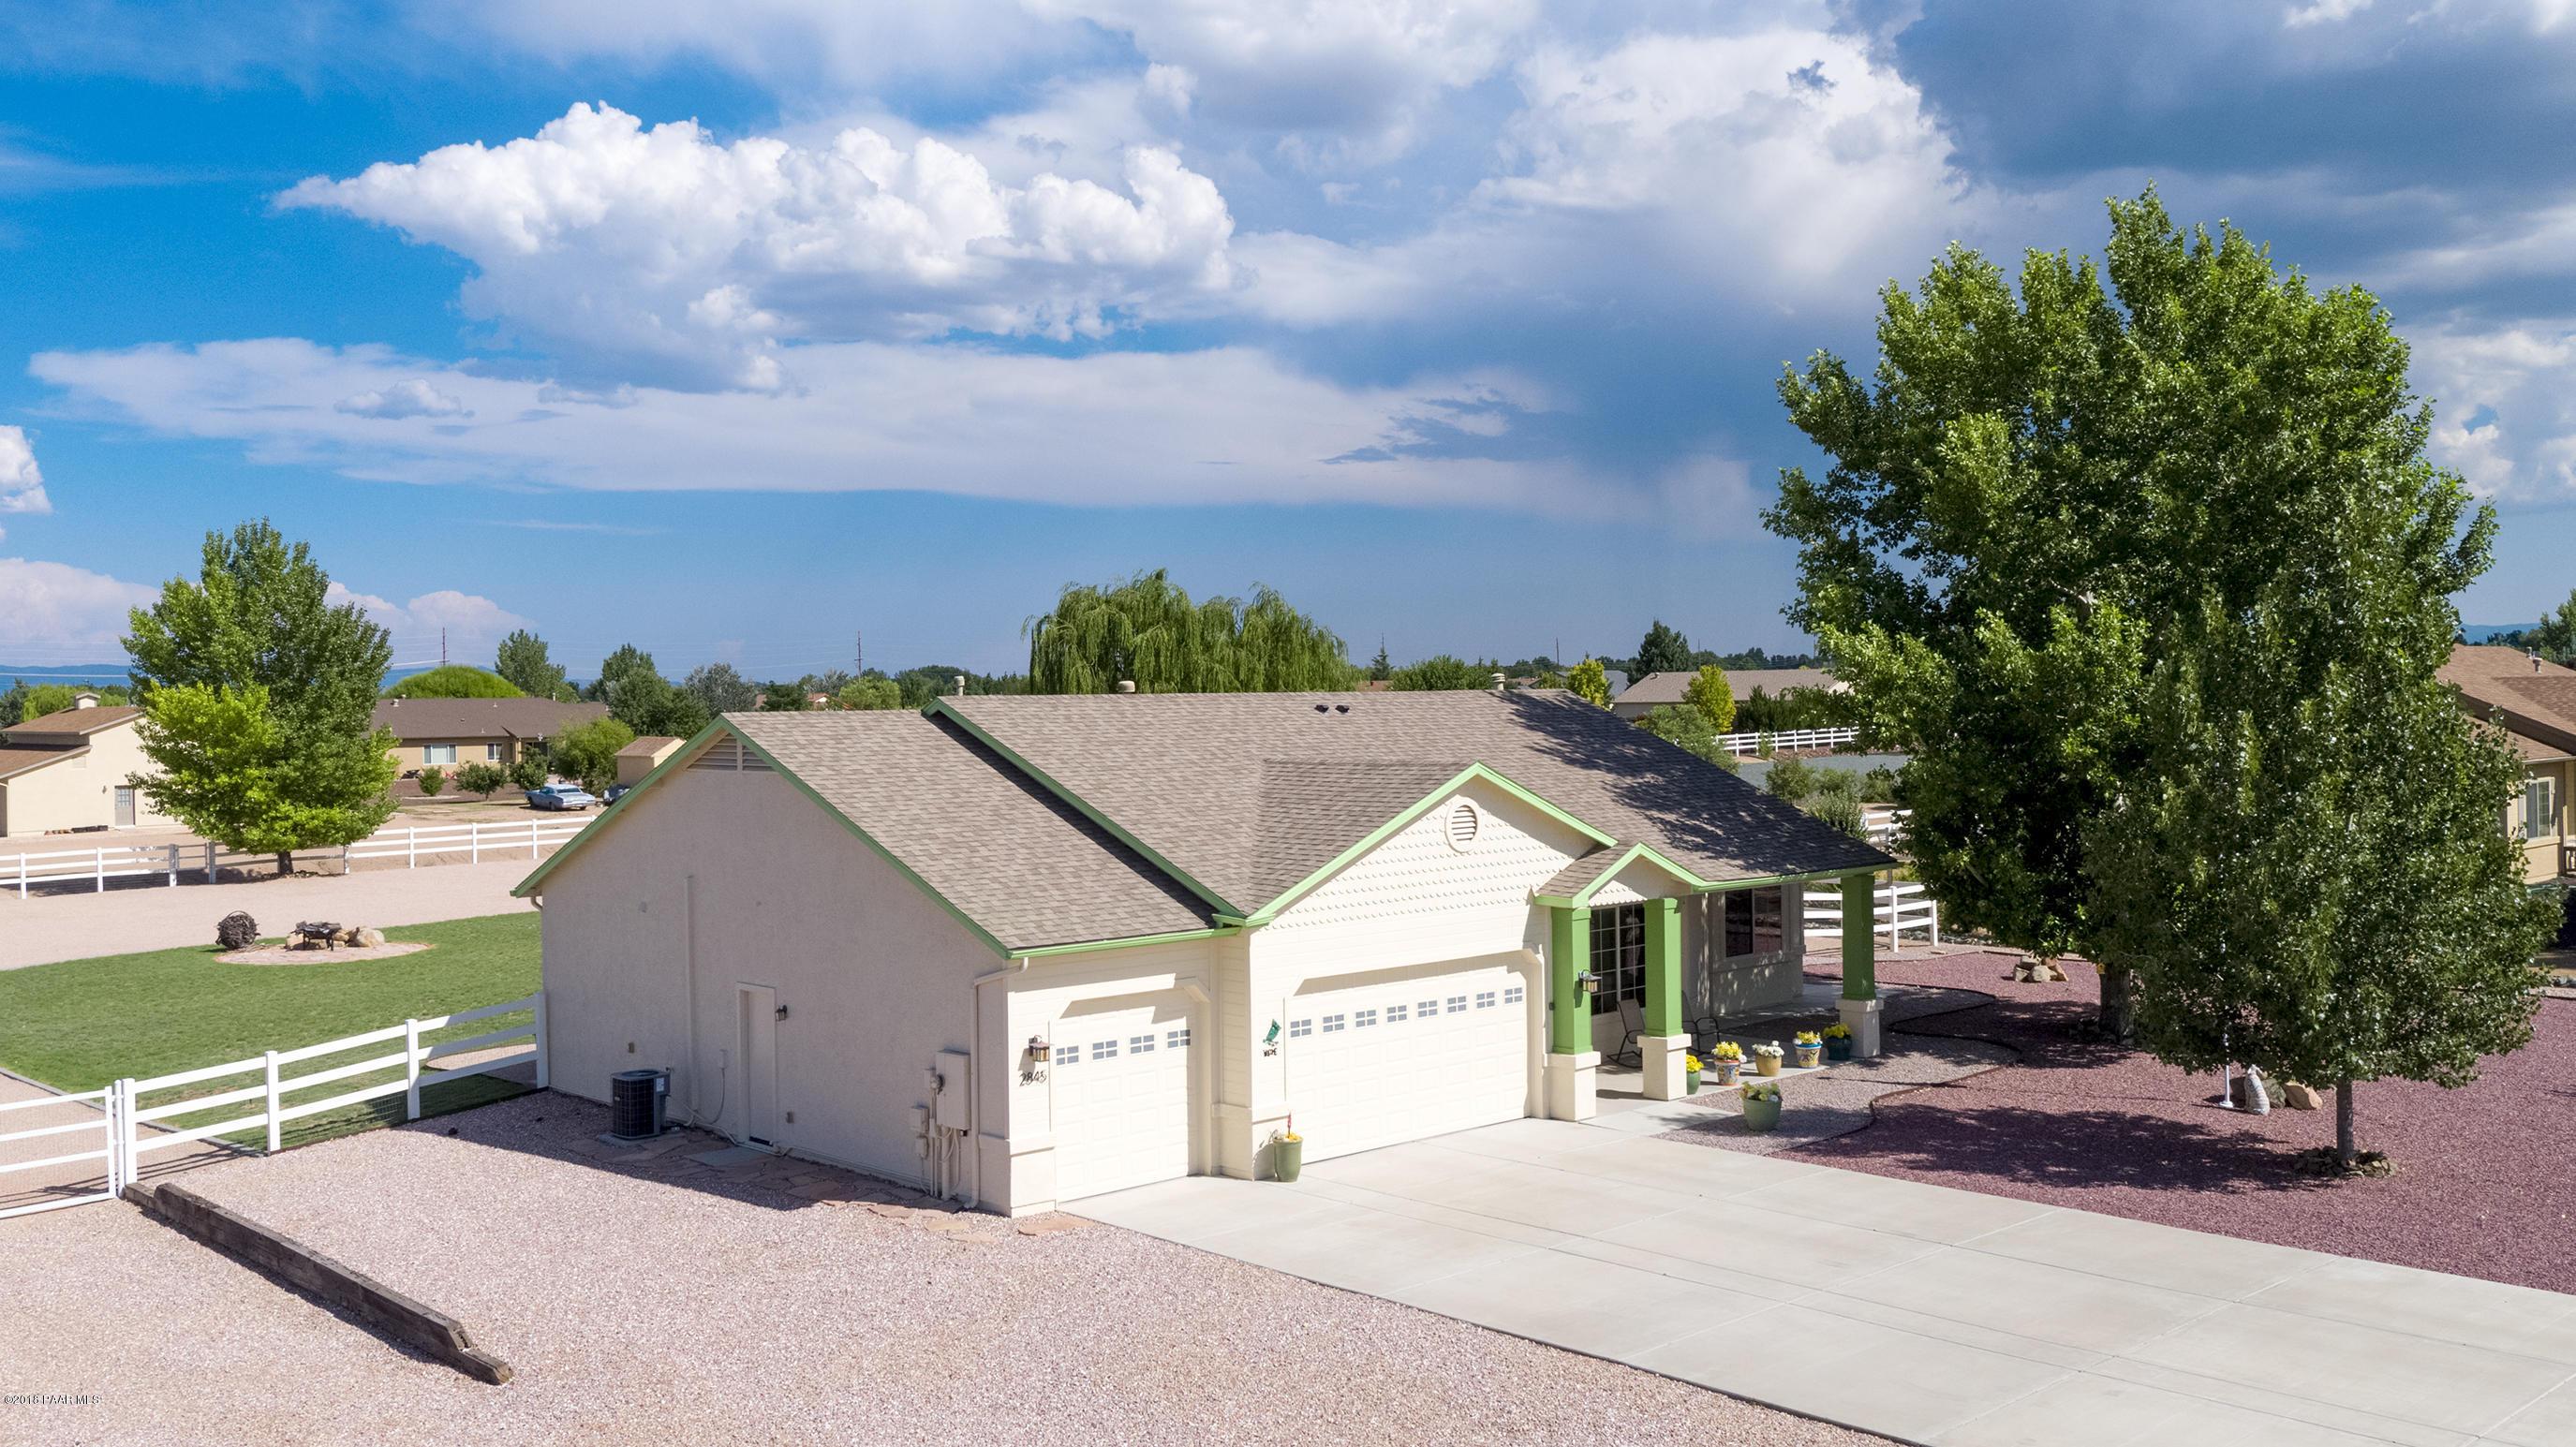 2845 Harrison Drive Chino Valley, AZ 86323 - MLS #: 1014496